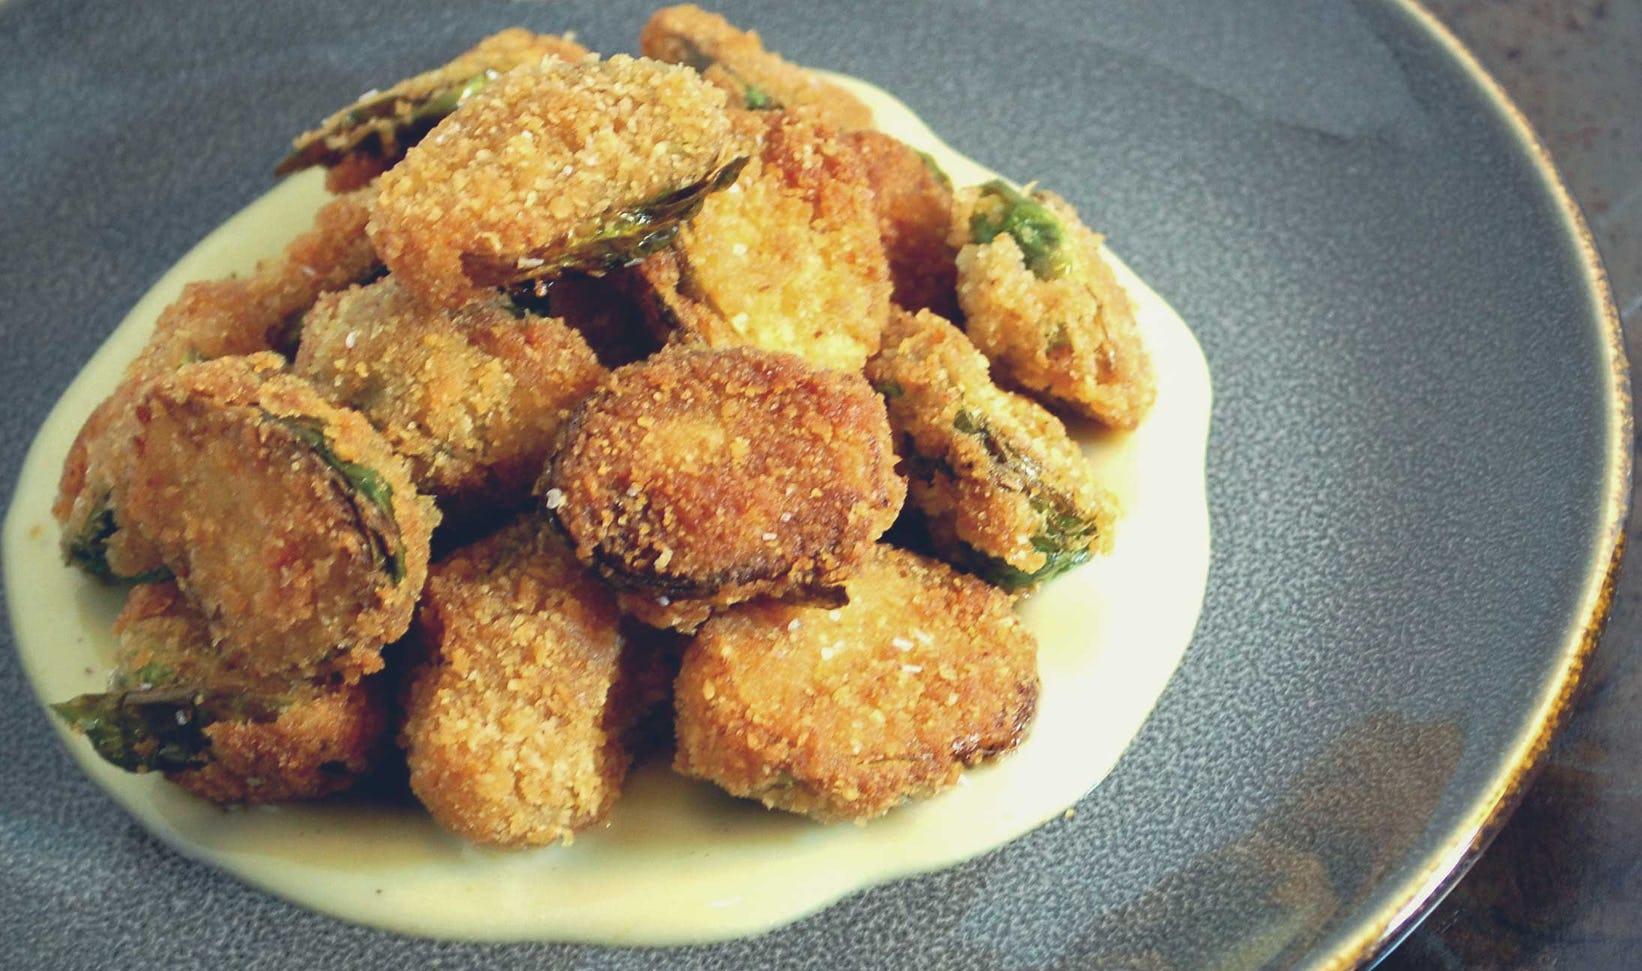 Appetizer: Buffalo Brussels Sprouts